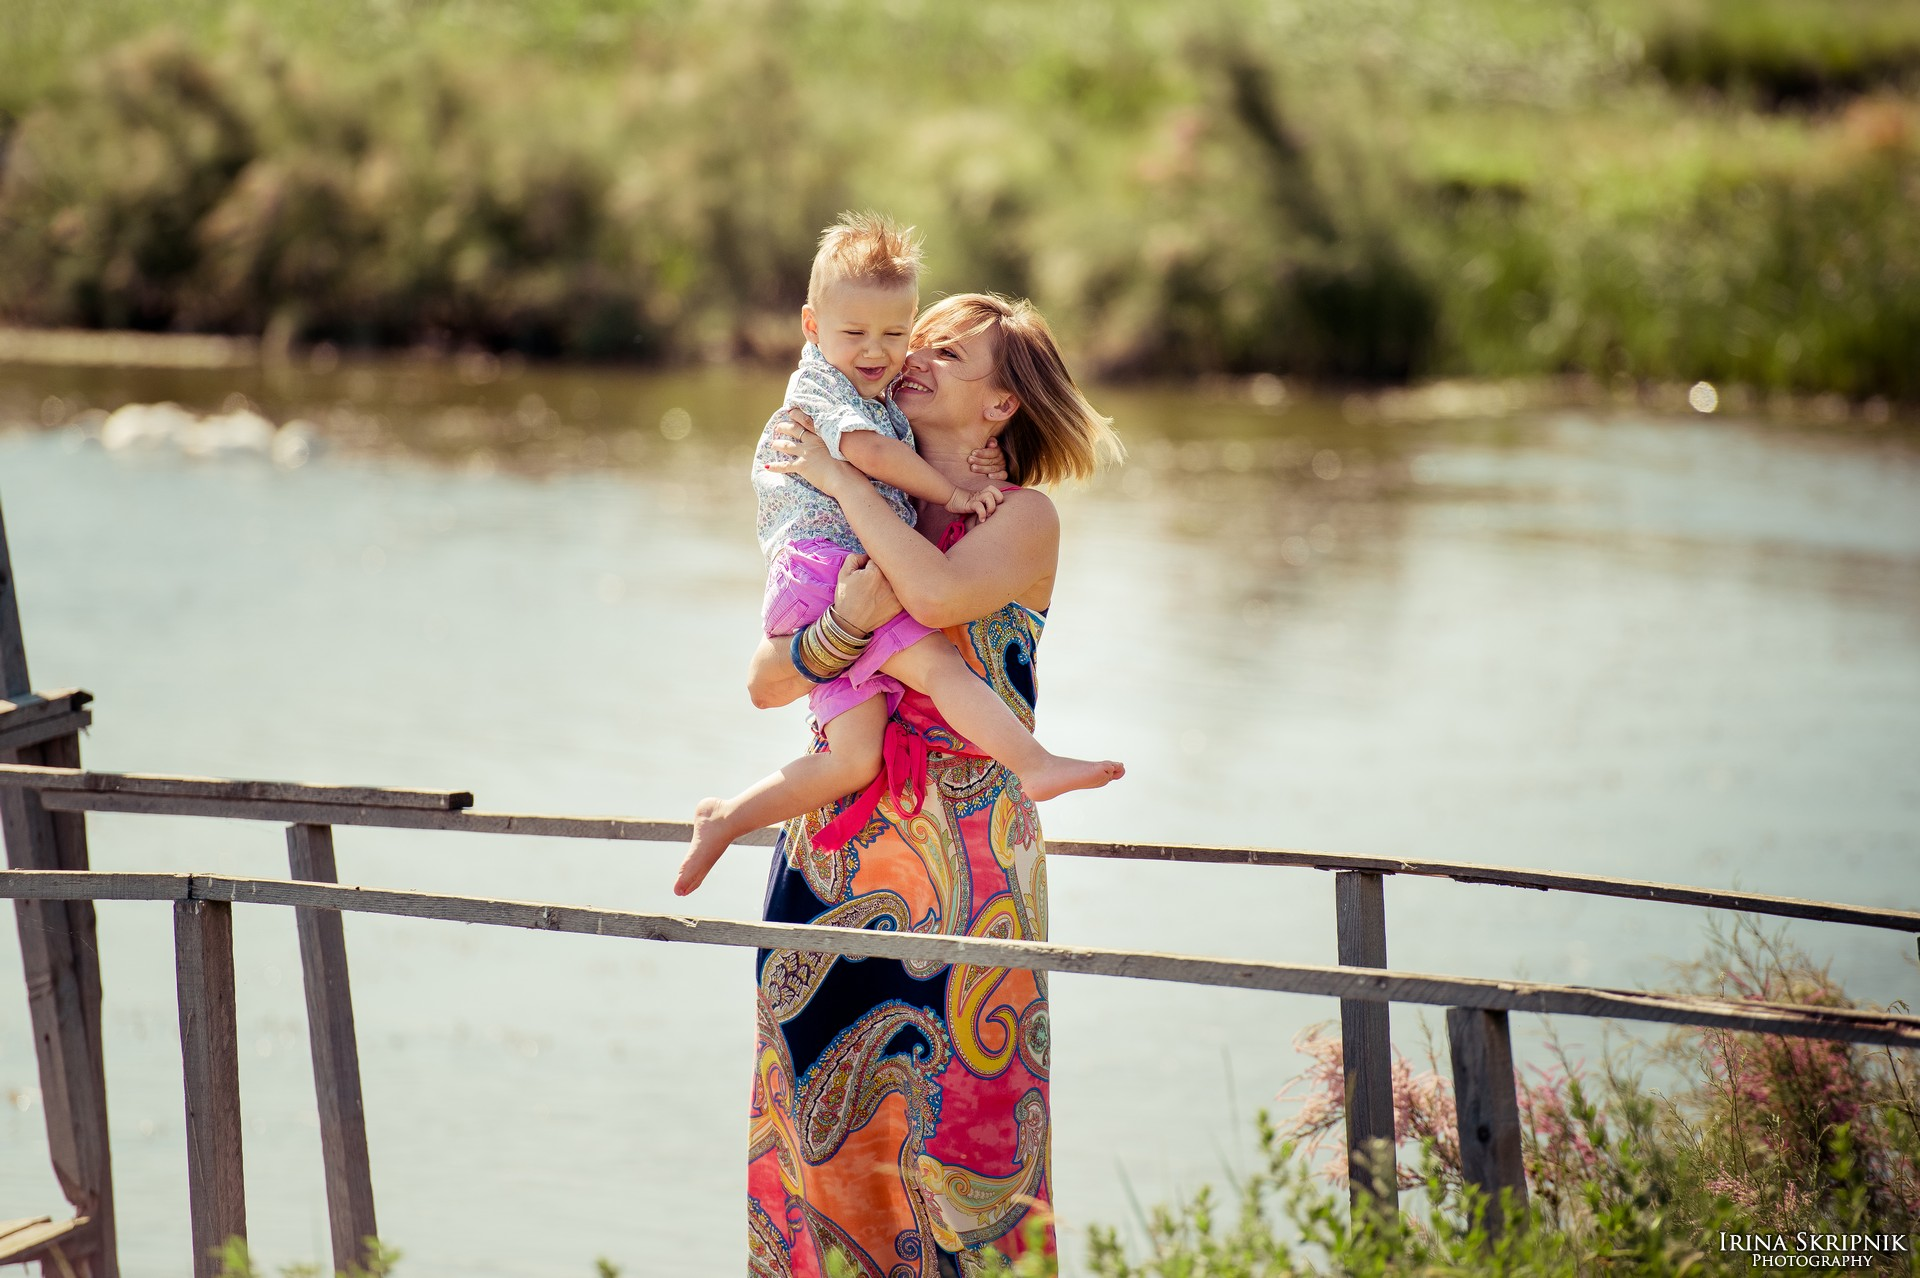 Irina Skripnik Photography 20161